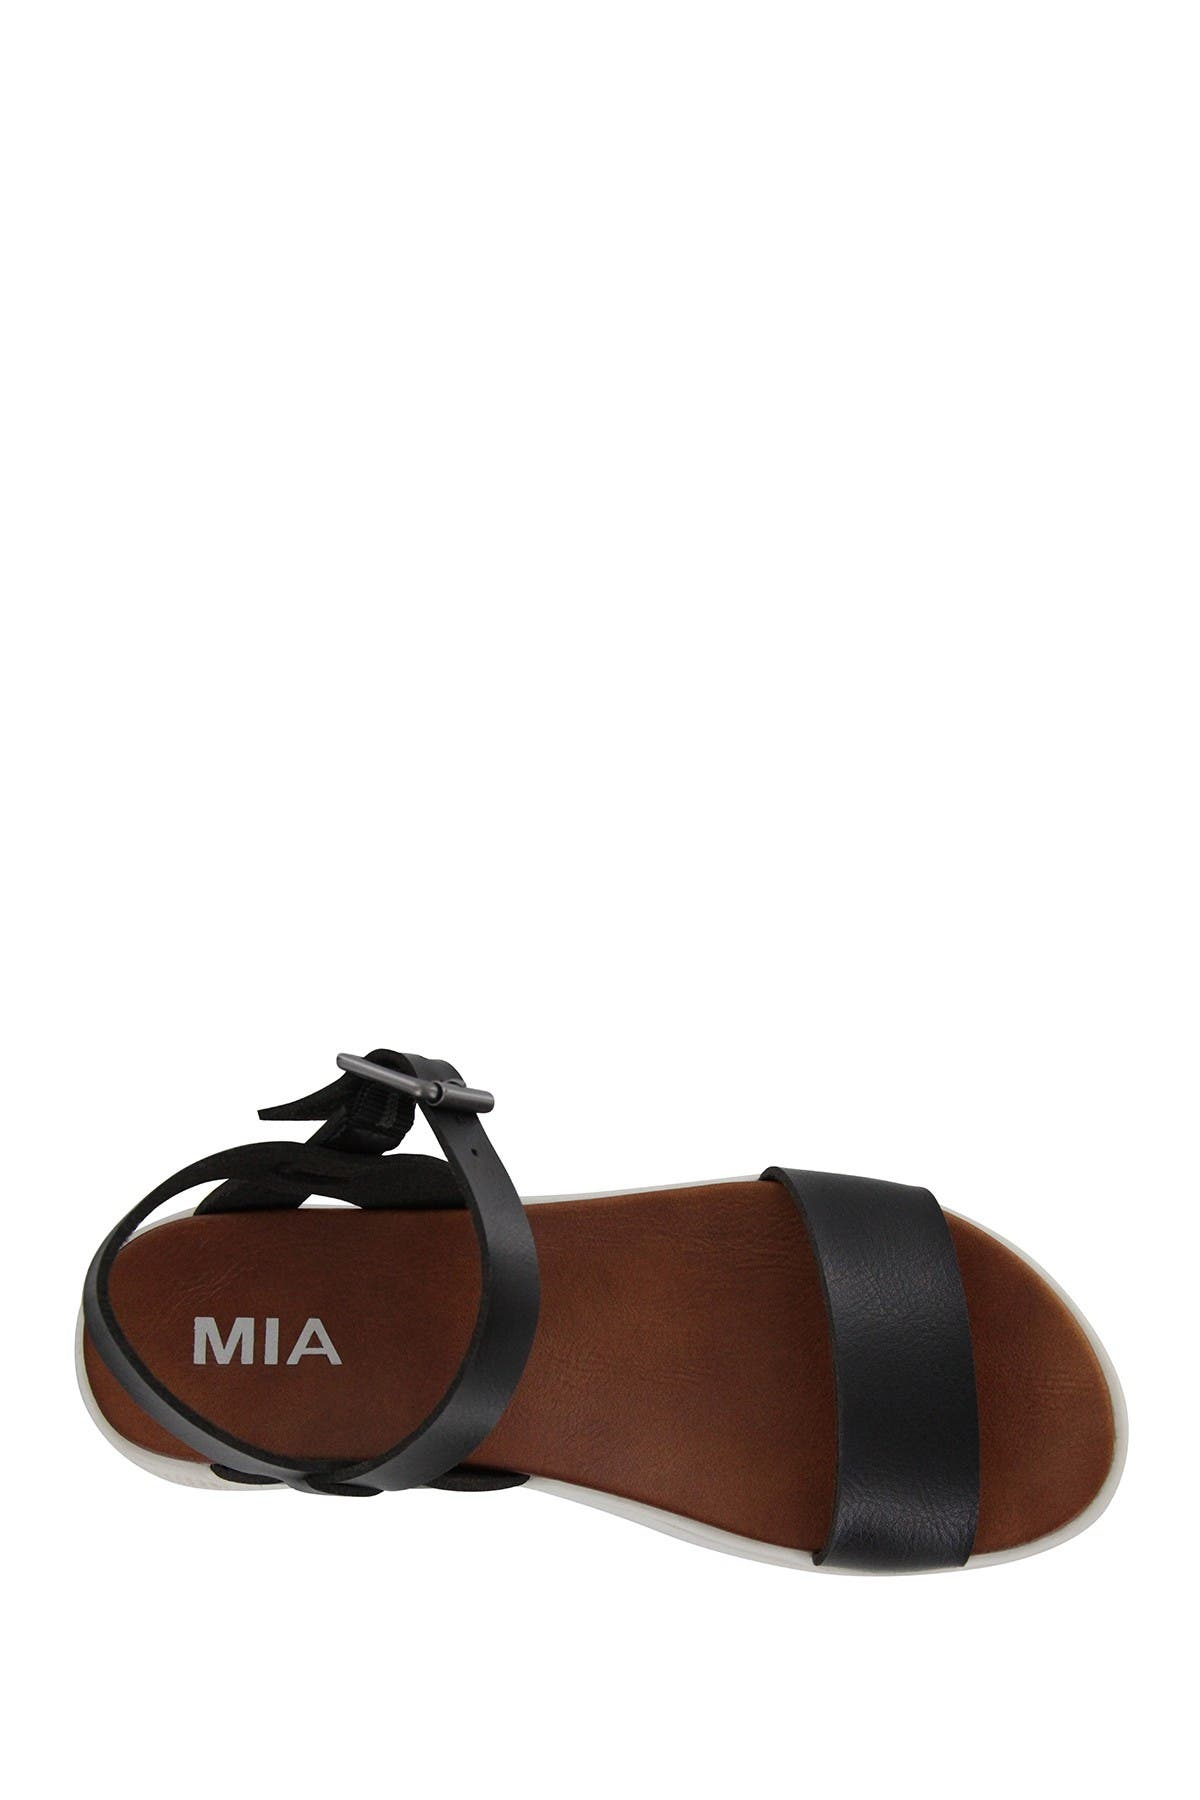 MIA   Abby Open Toe Platform Sandal